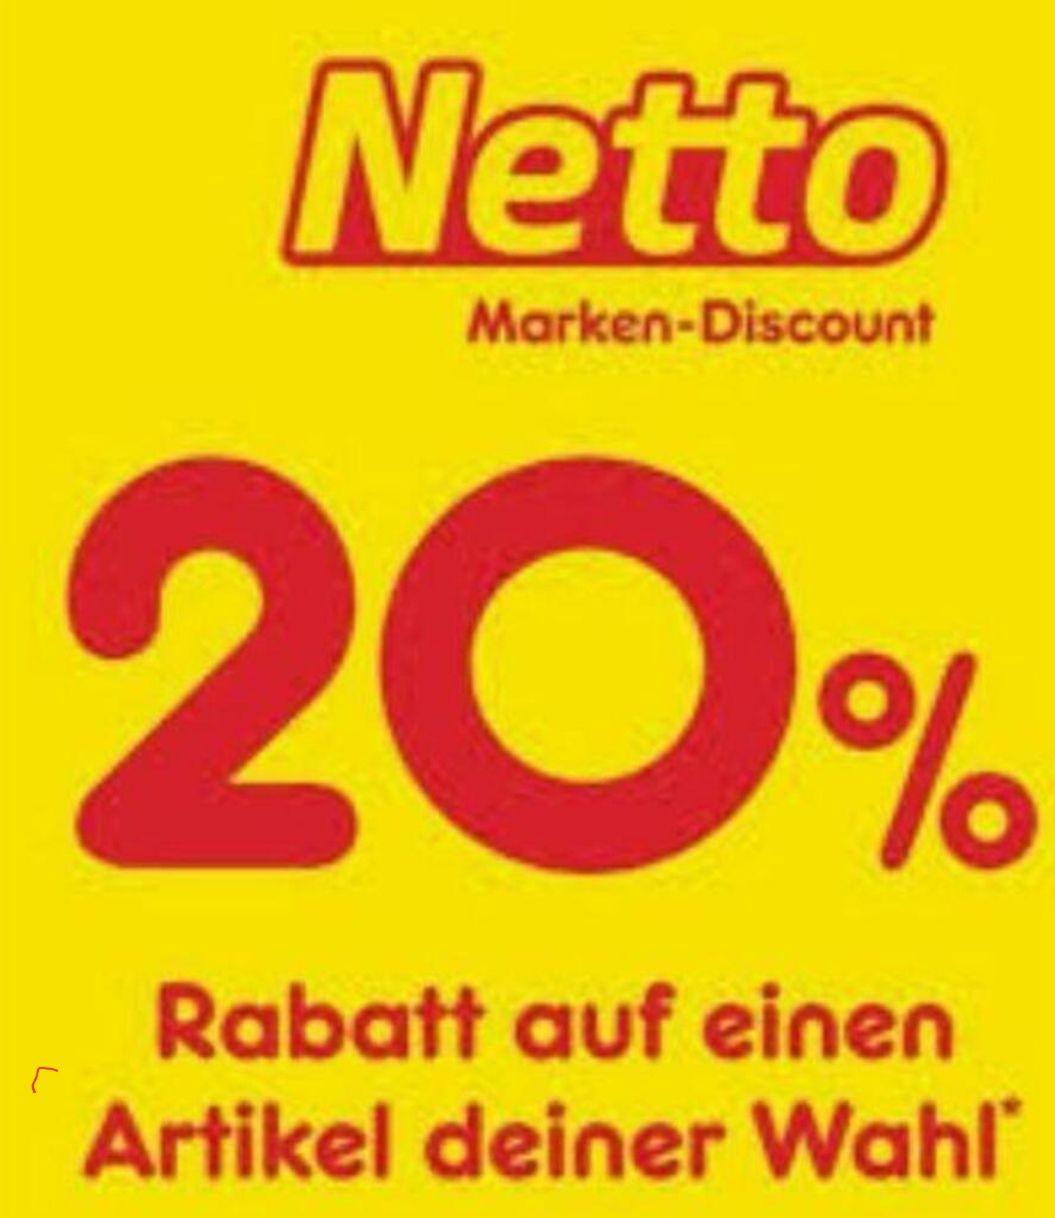 [Netto MD] Rabatt Coupons KW43 (19.10. - 24.10.), bundesweit einsetzbar